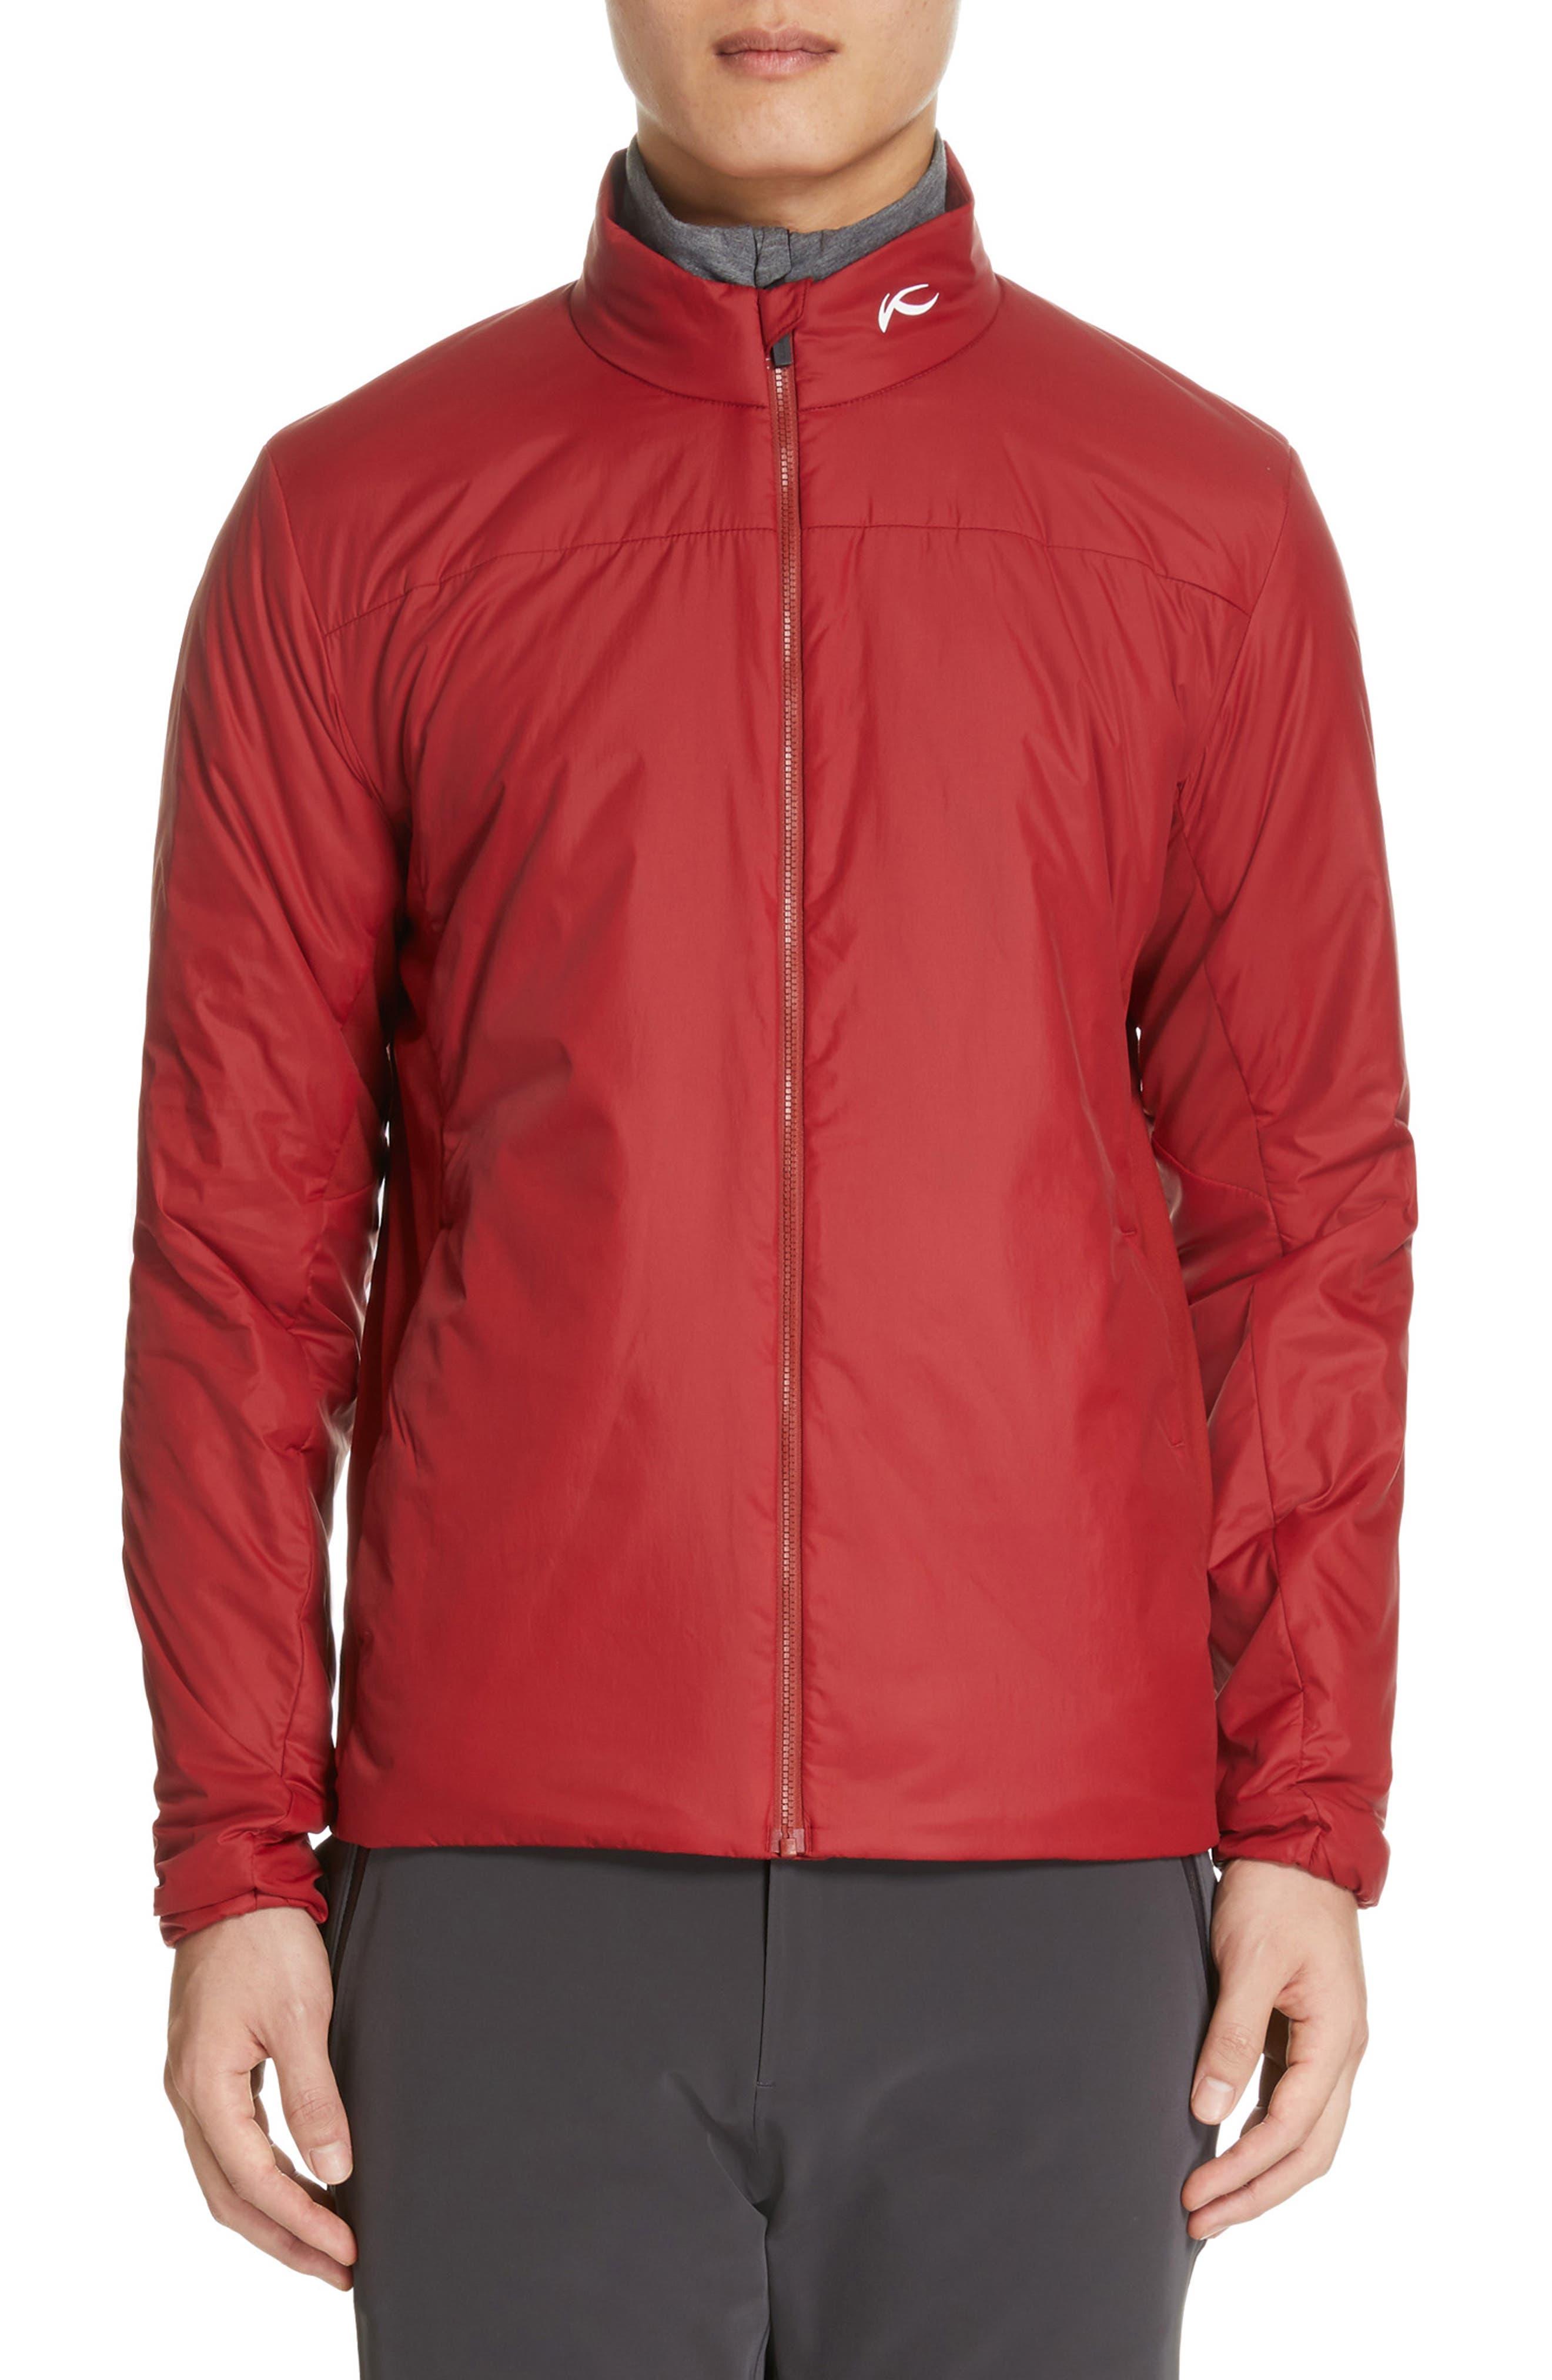 Radiation Waterproof Jacket,                             Alternate thumbnail 2, color,                             RED DAHLIA